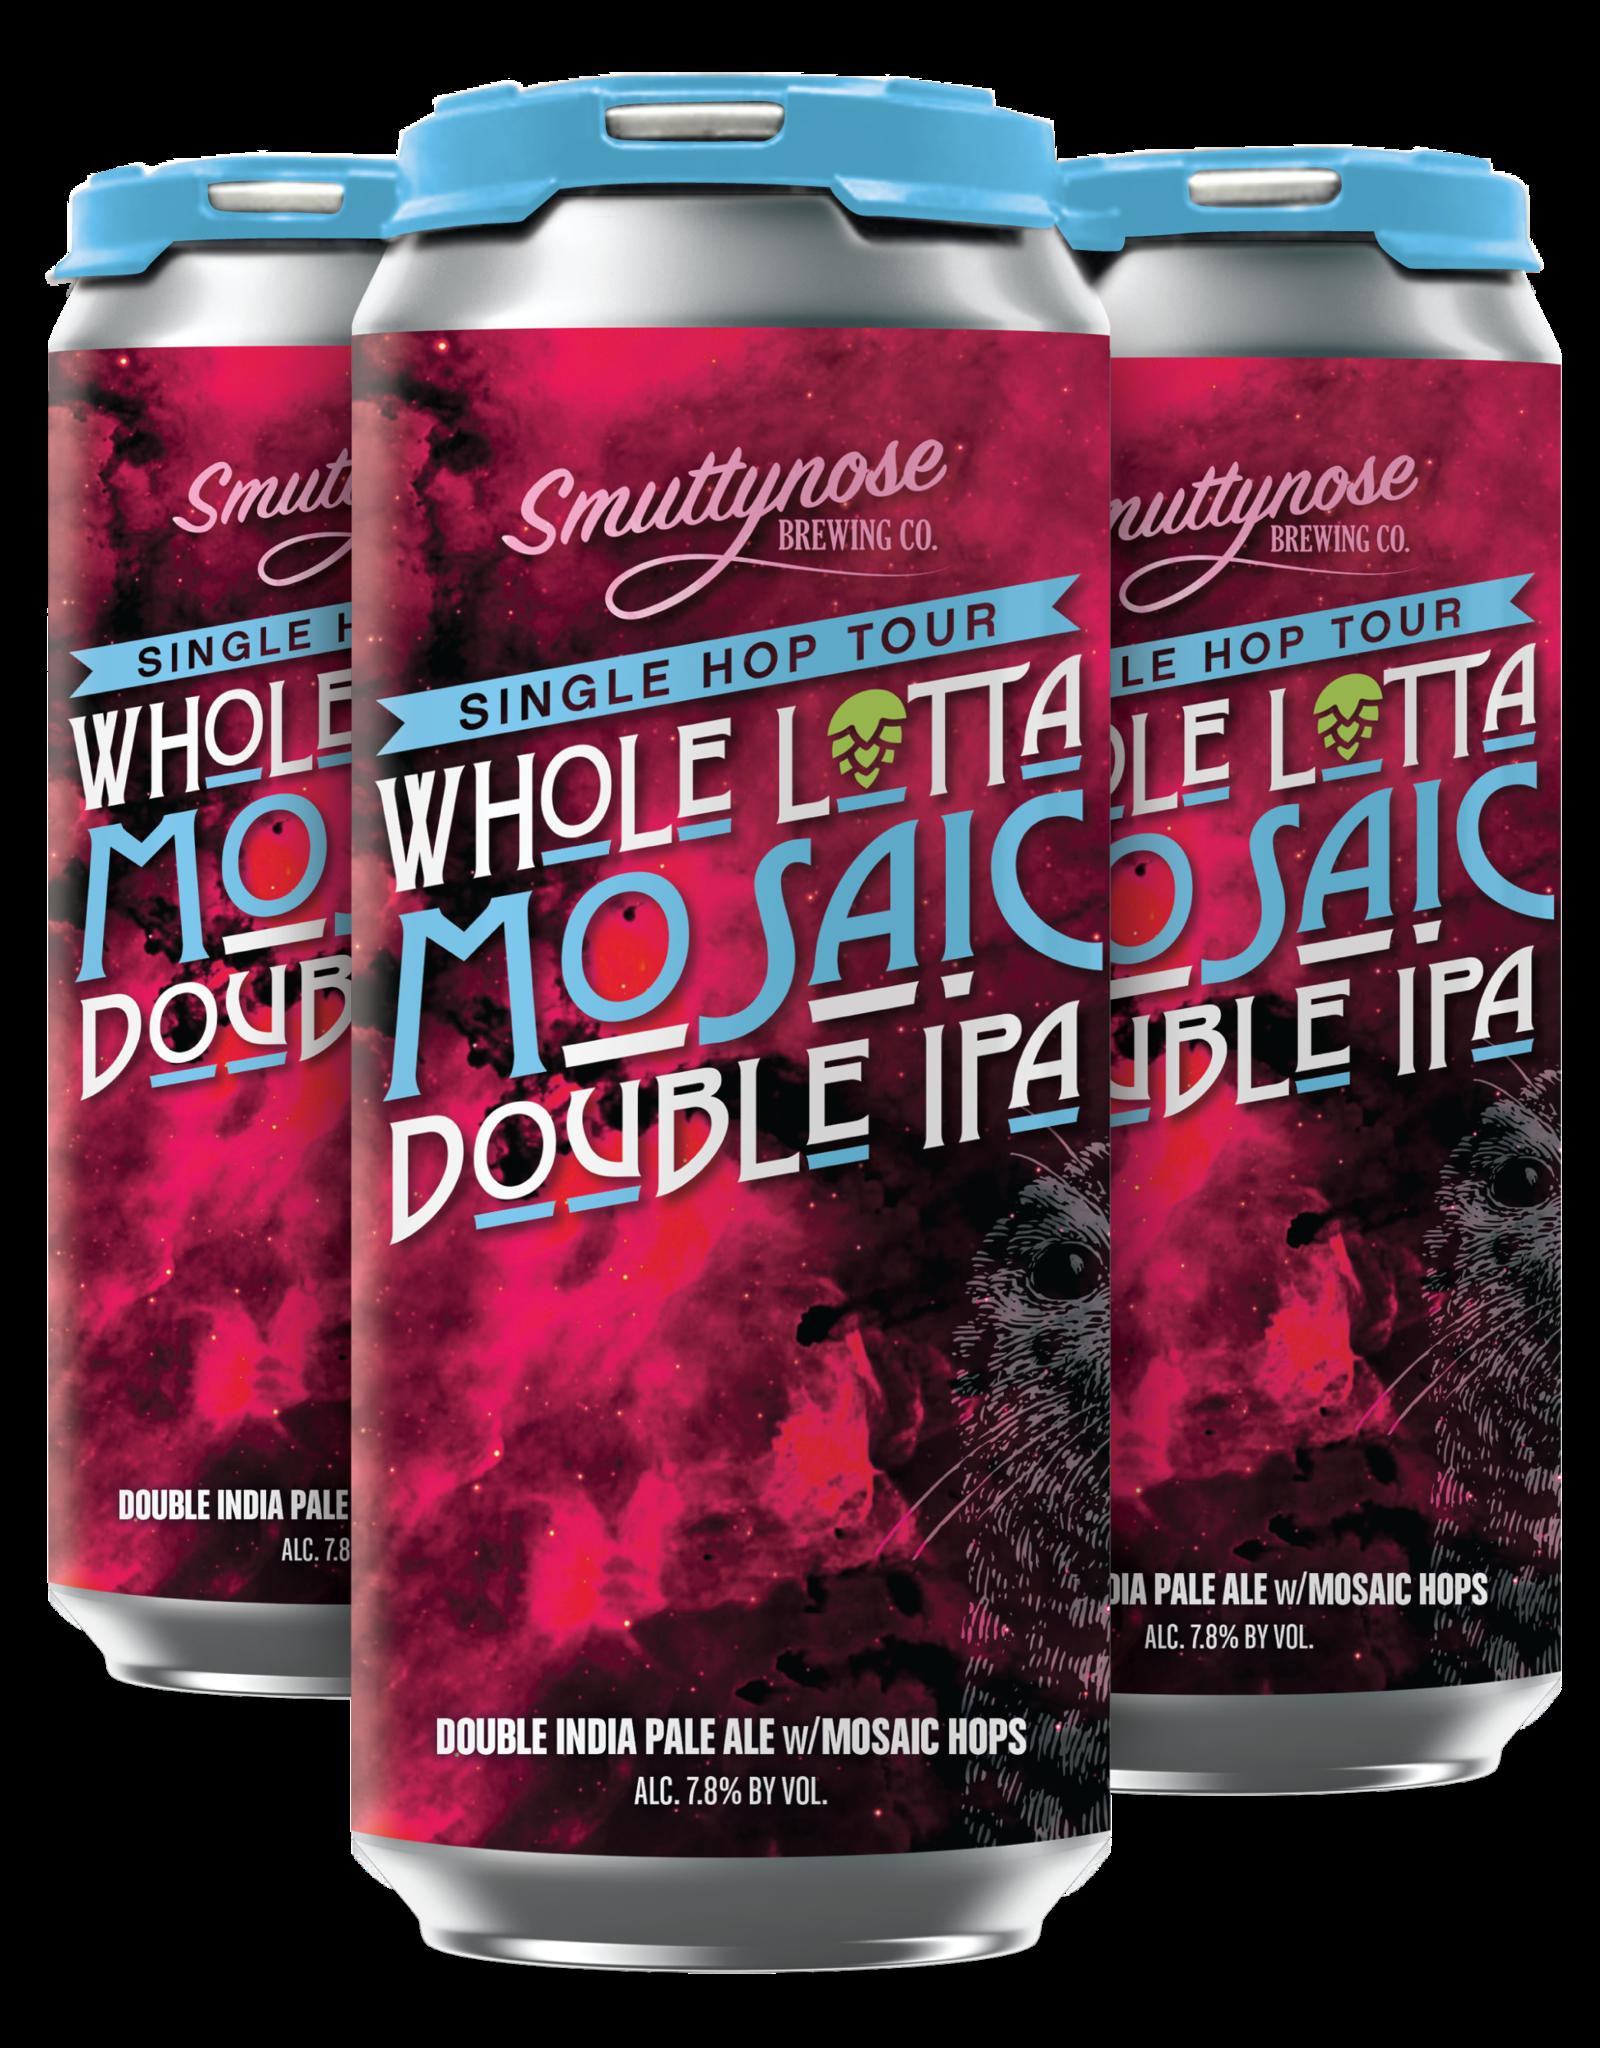 Smuttynose Whole Lotta Mosaic DIPA 16oz 4pk Cans